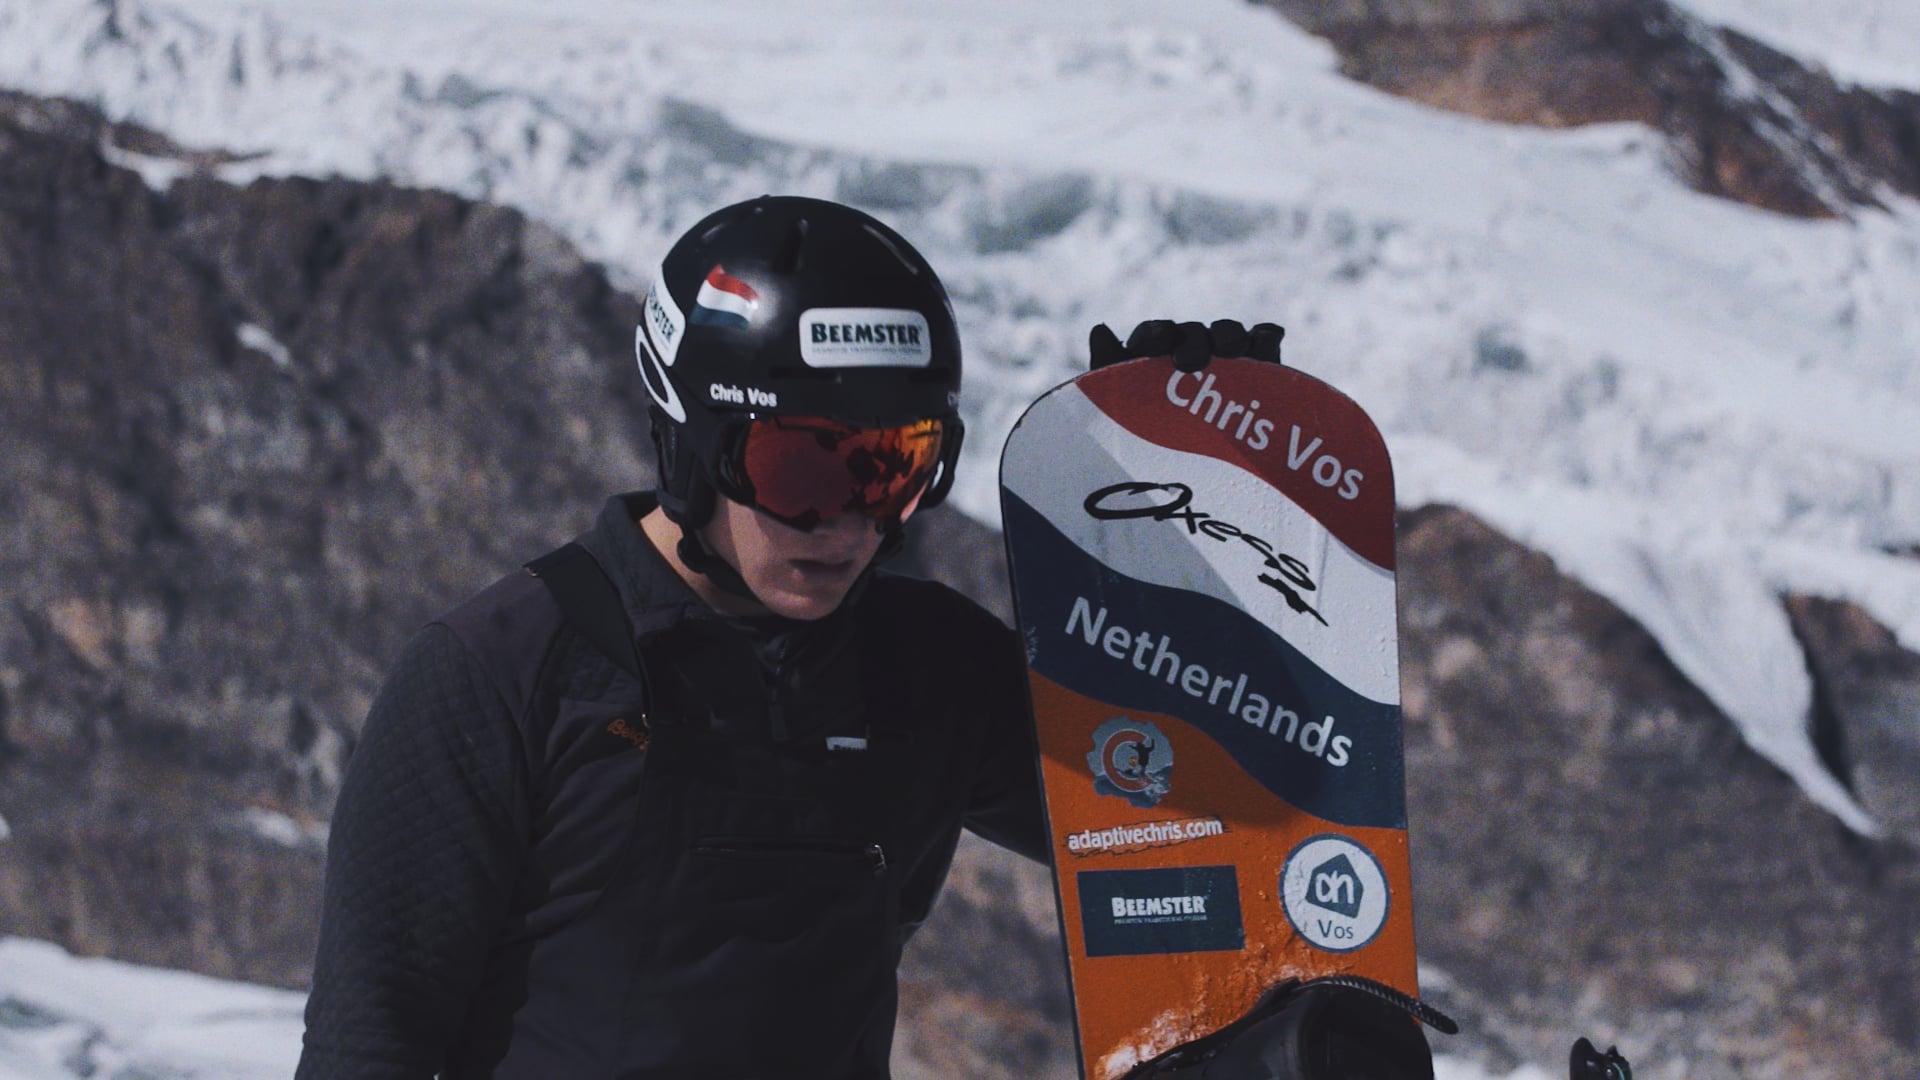 Paralympics 2018 | Chris Vos